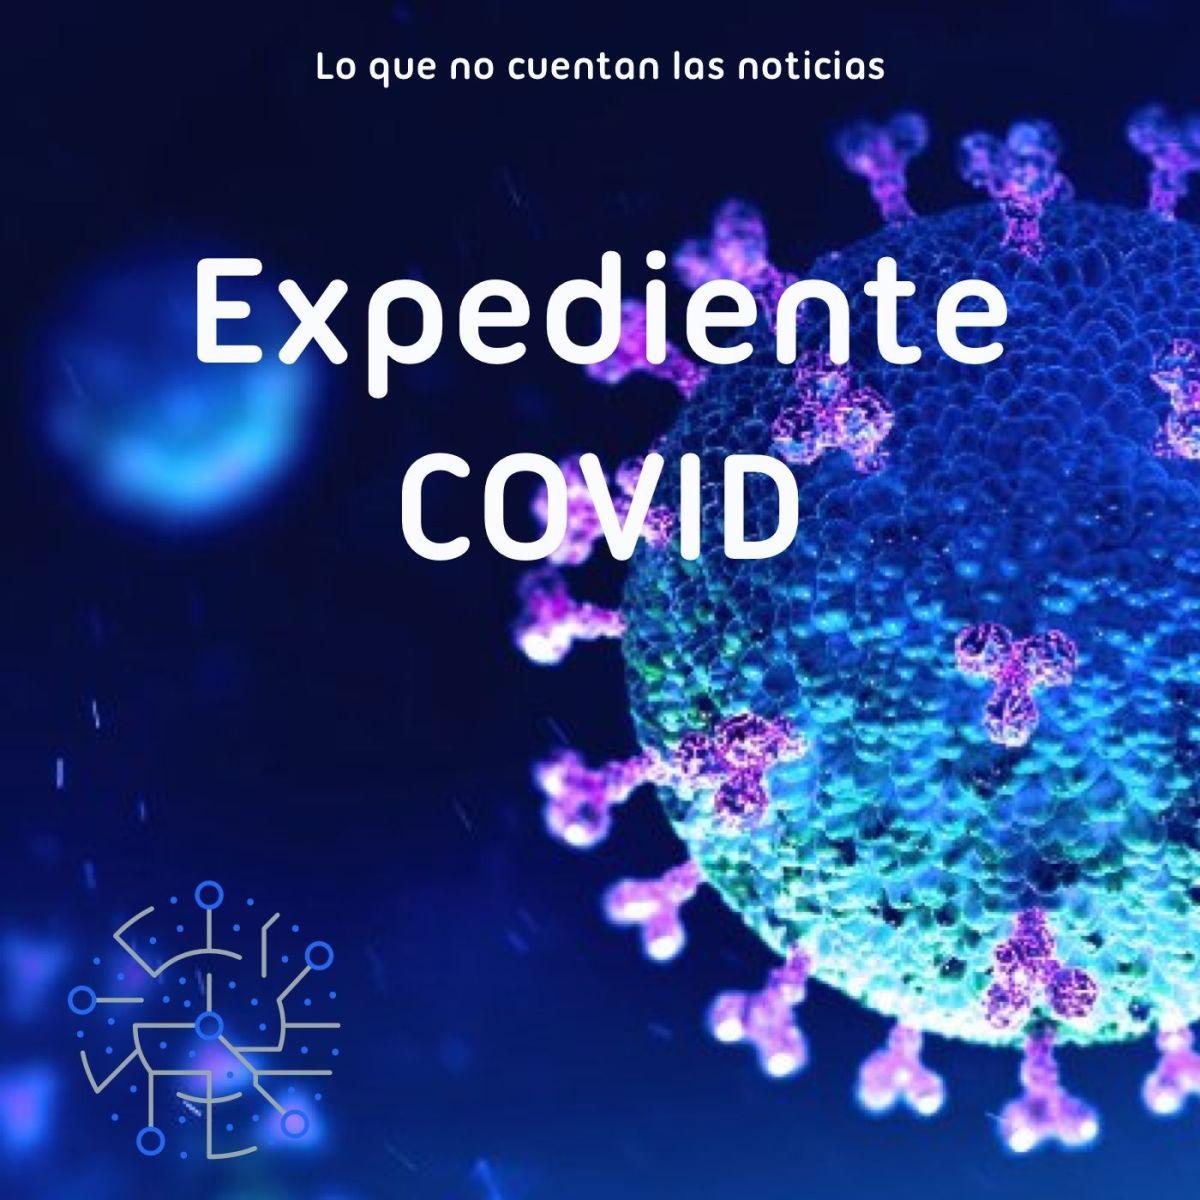 Expediente Covid